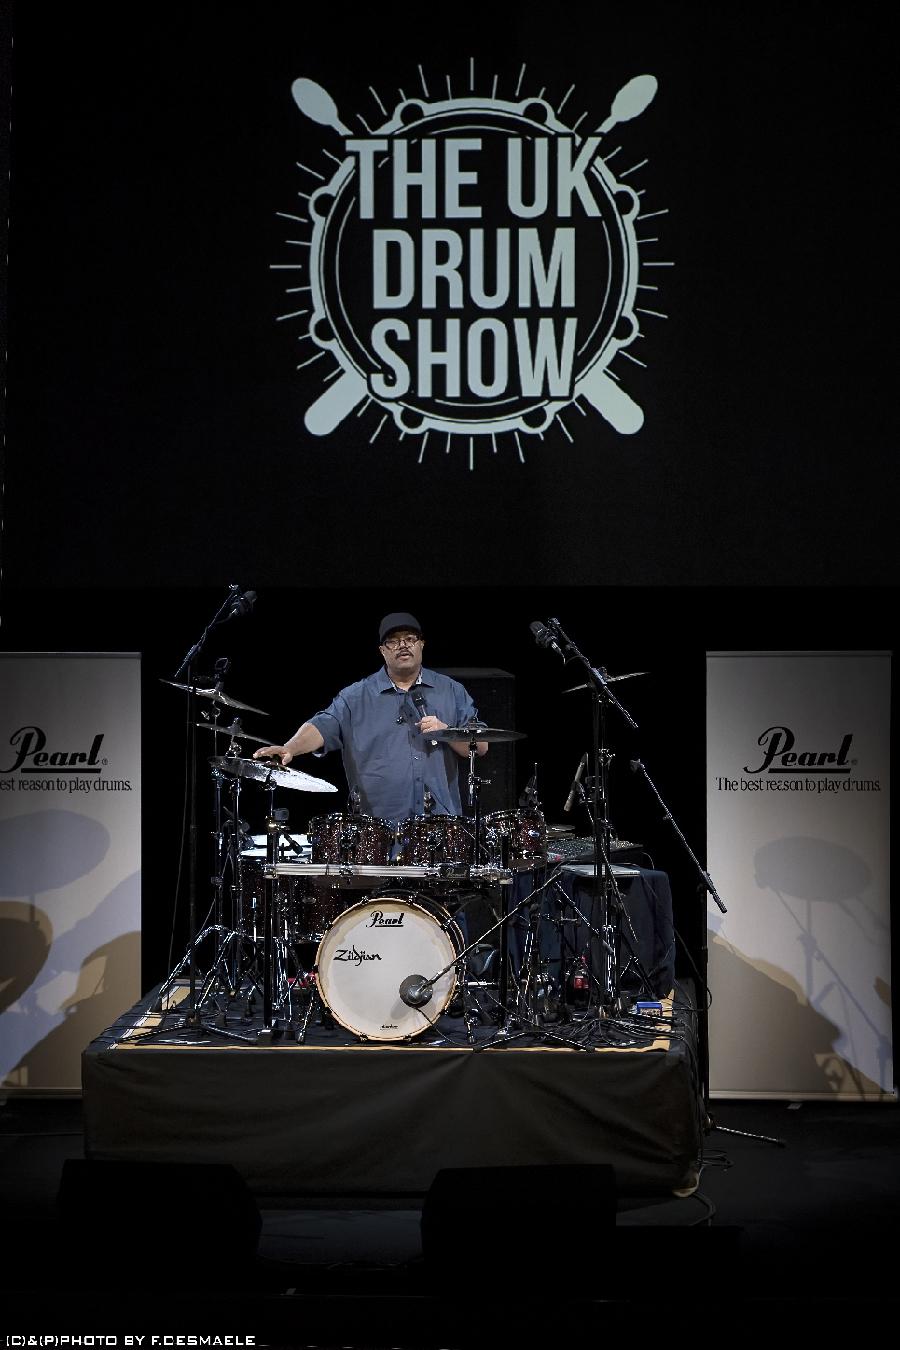 Francesco Desmaele The Uk Drum Show 2017 Dennis Chambers